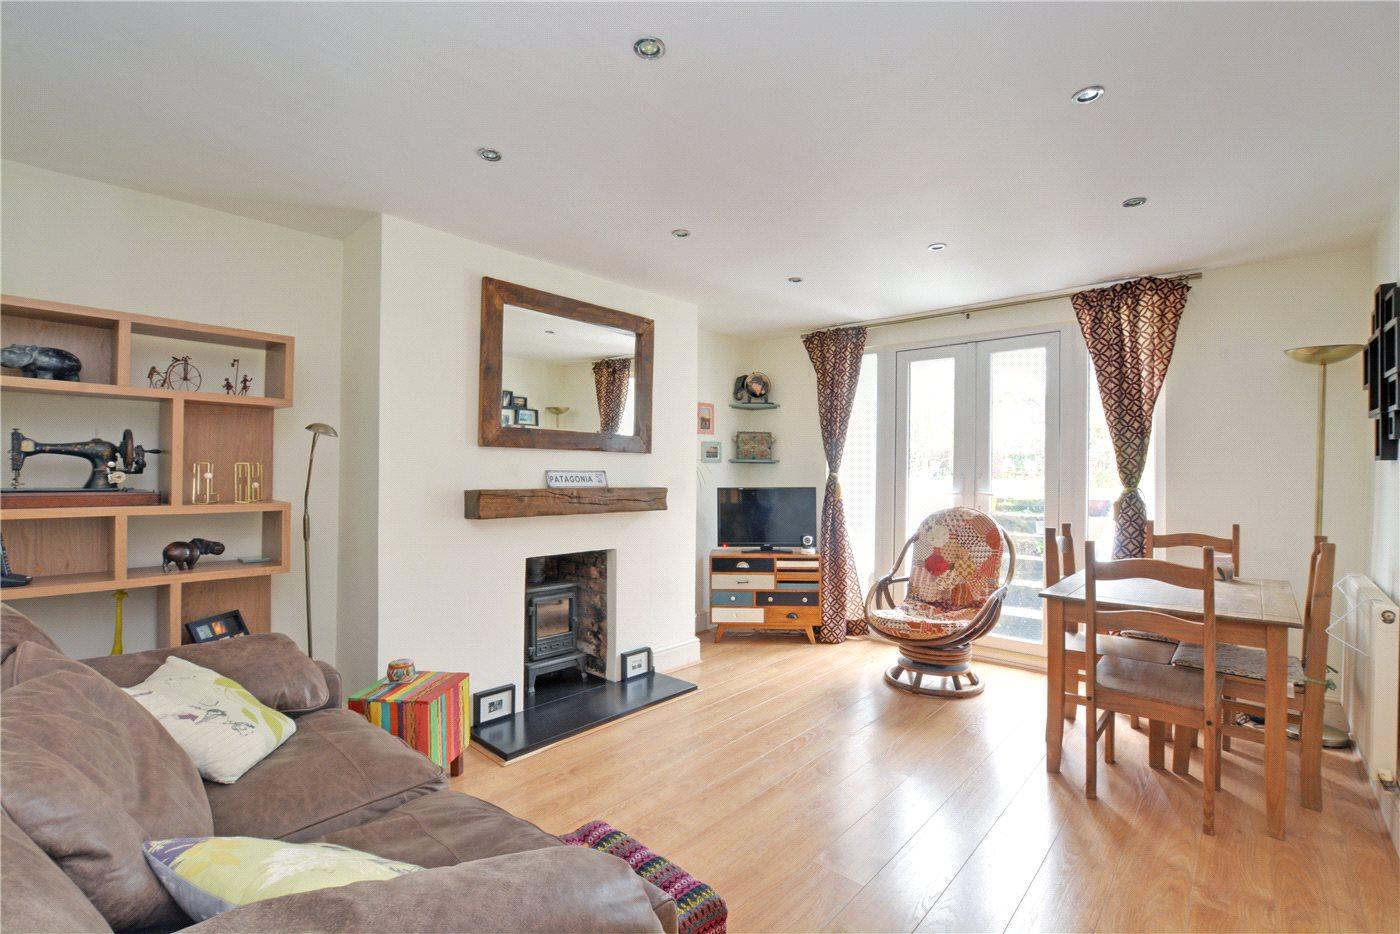 1 bedroom property to rent in Lee Road, Blackheath, SE3 - £1375 pcm